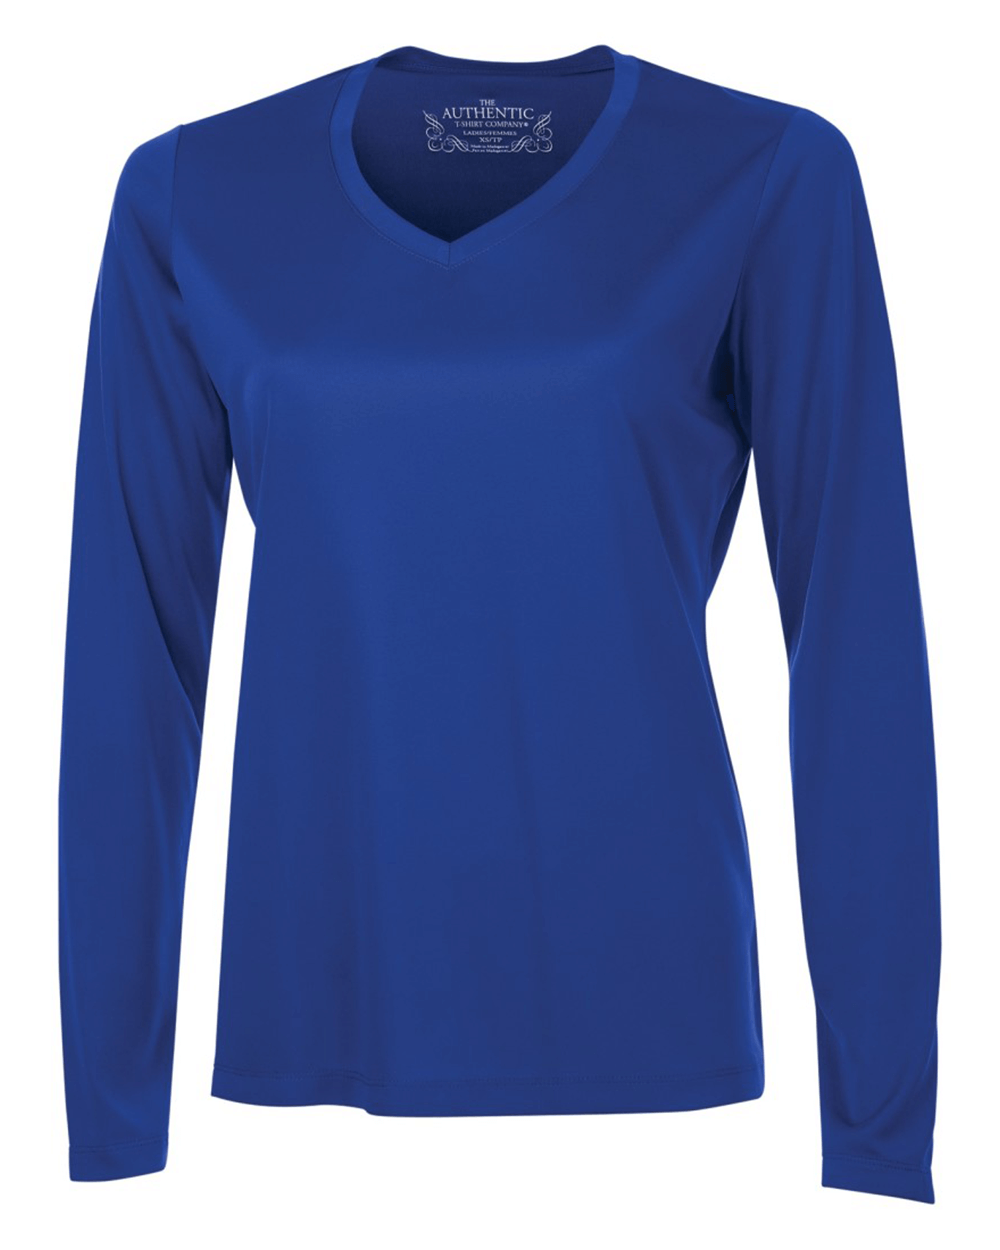 Pro Team Ladies' Longsleeve V-Neck T-Shirt